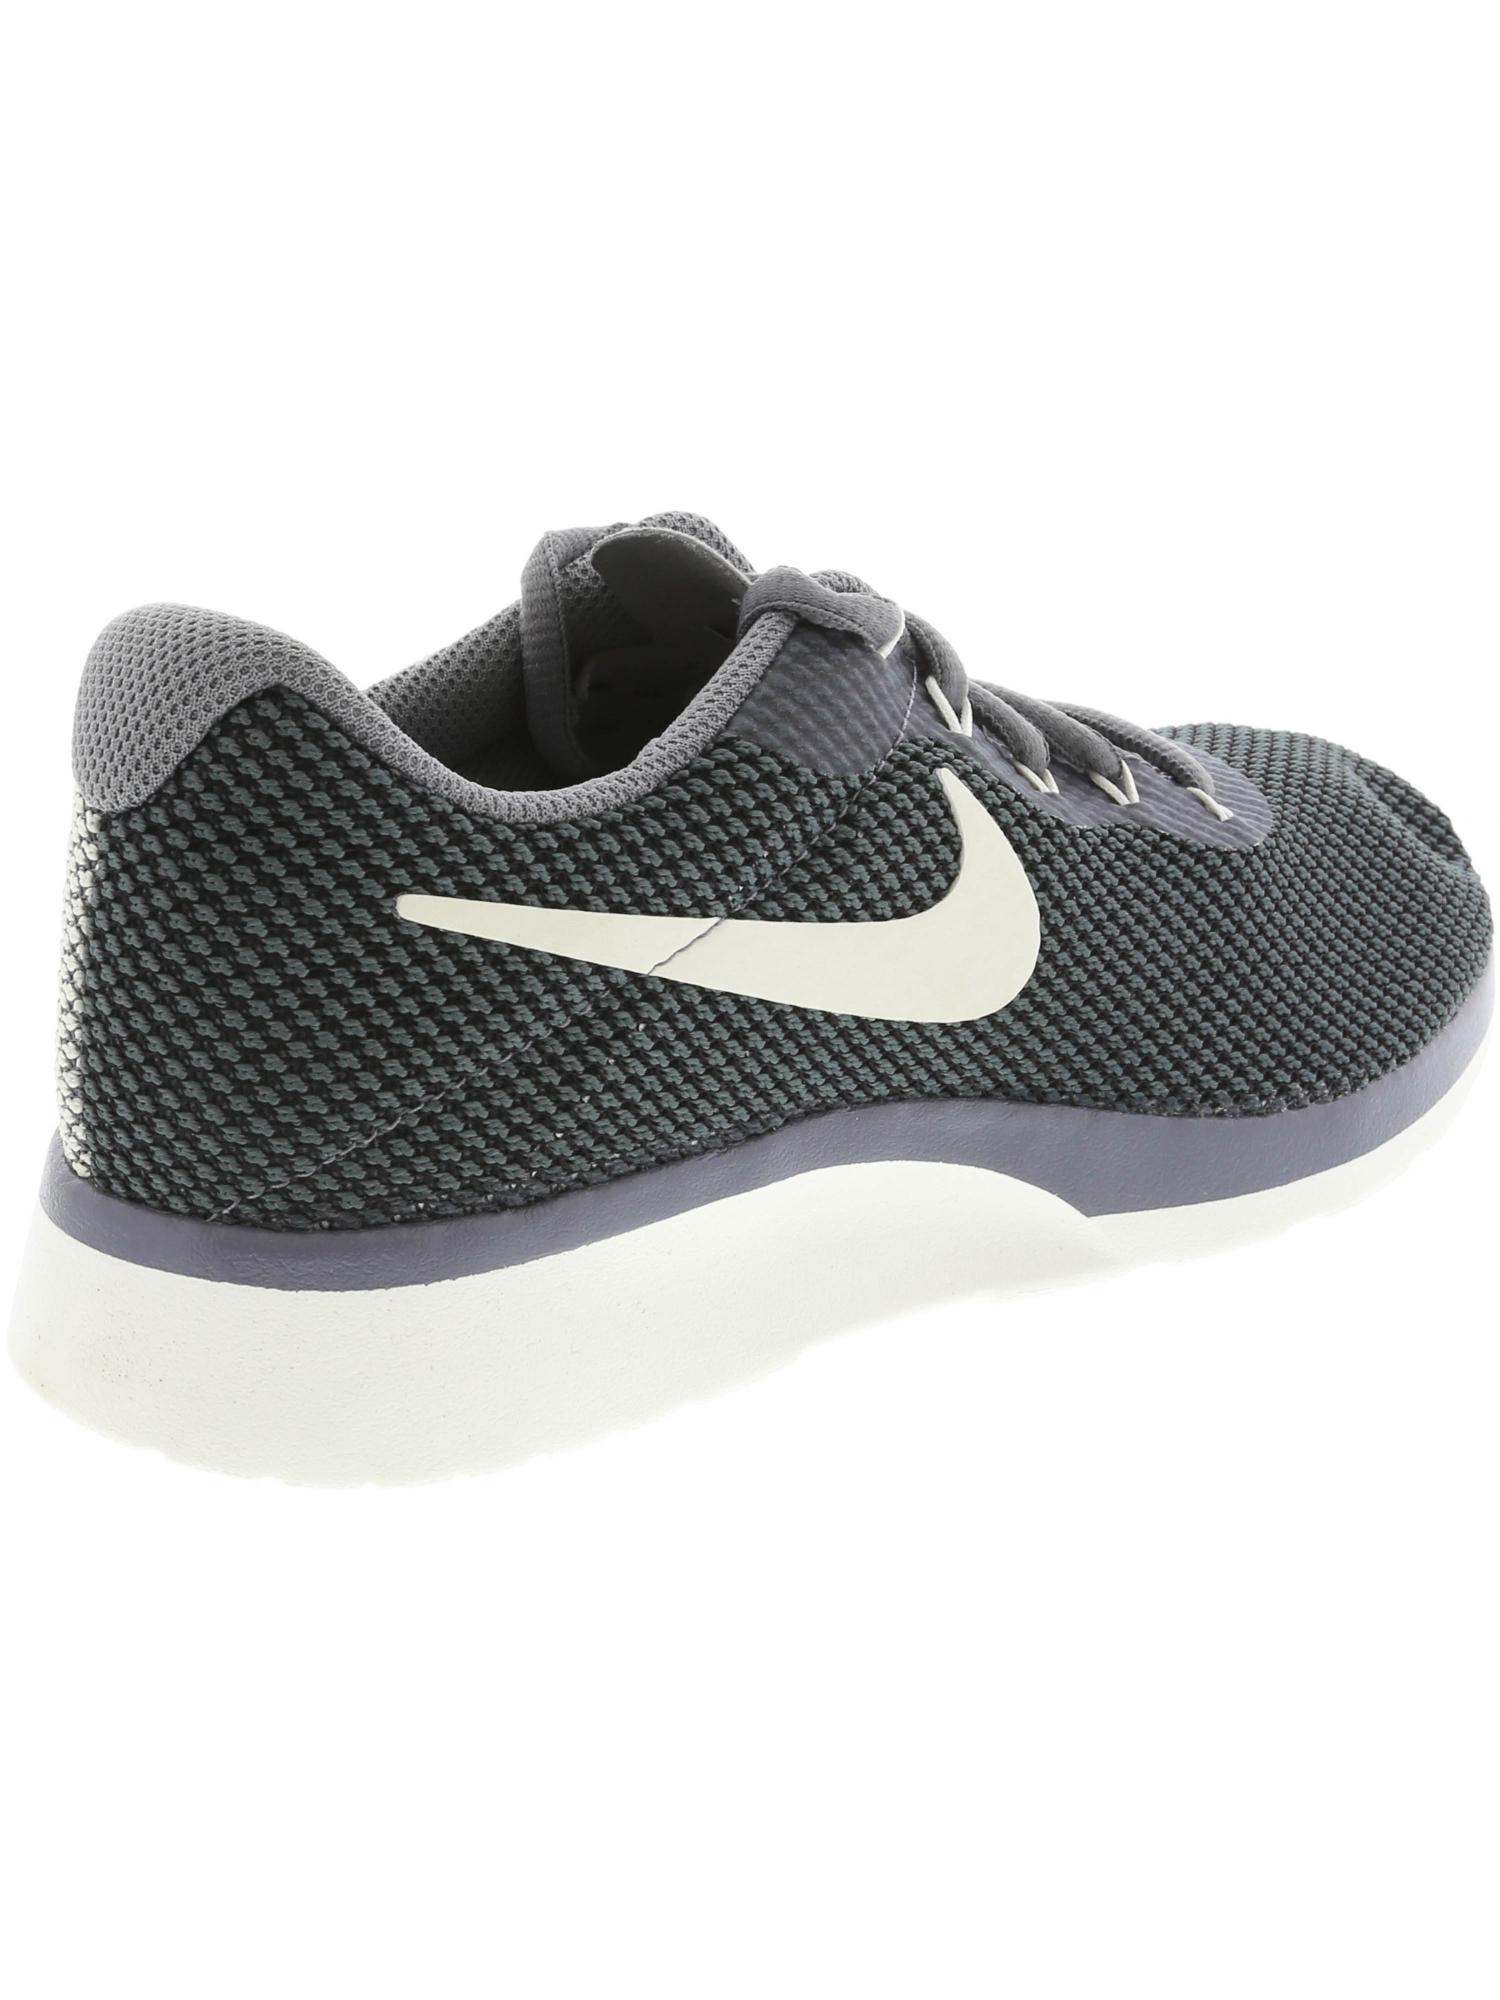 9f24b6850c9c Nike Women s Tanjun Racer Ankle-High Running Shoe